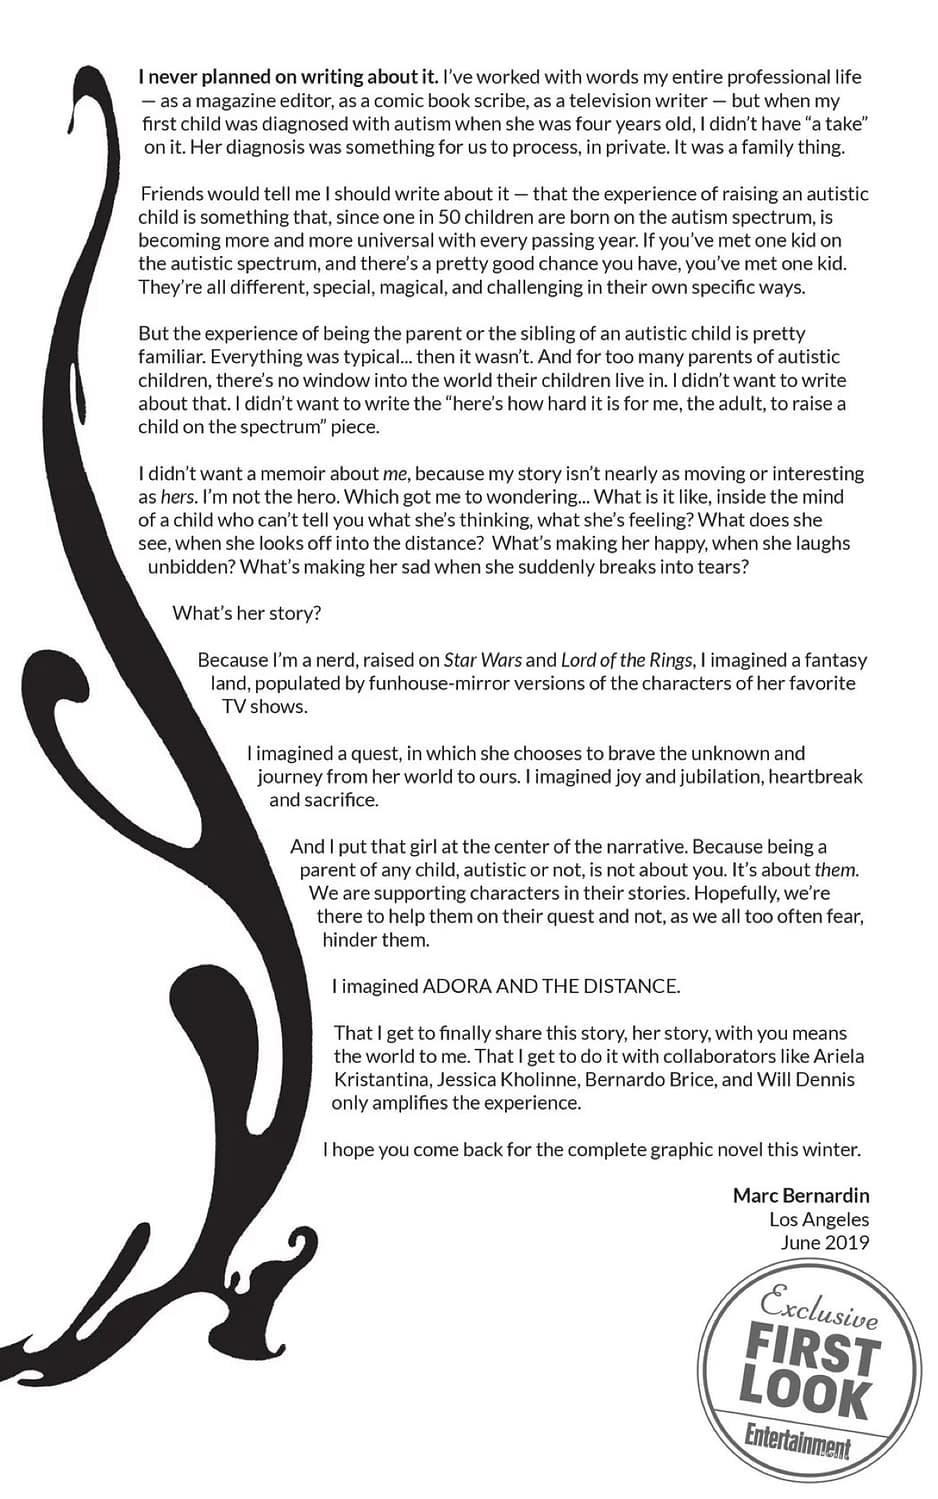 Adora and the Distance, a New ComiXology Original From Marc Bernadin and Ariela Kristantina